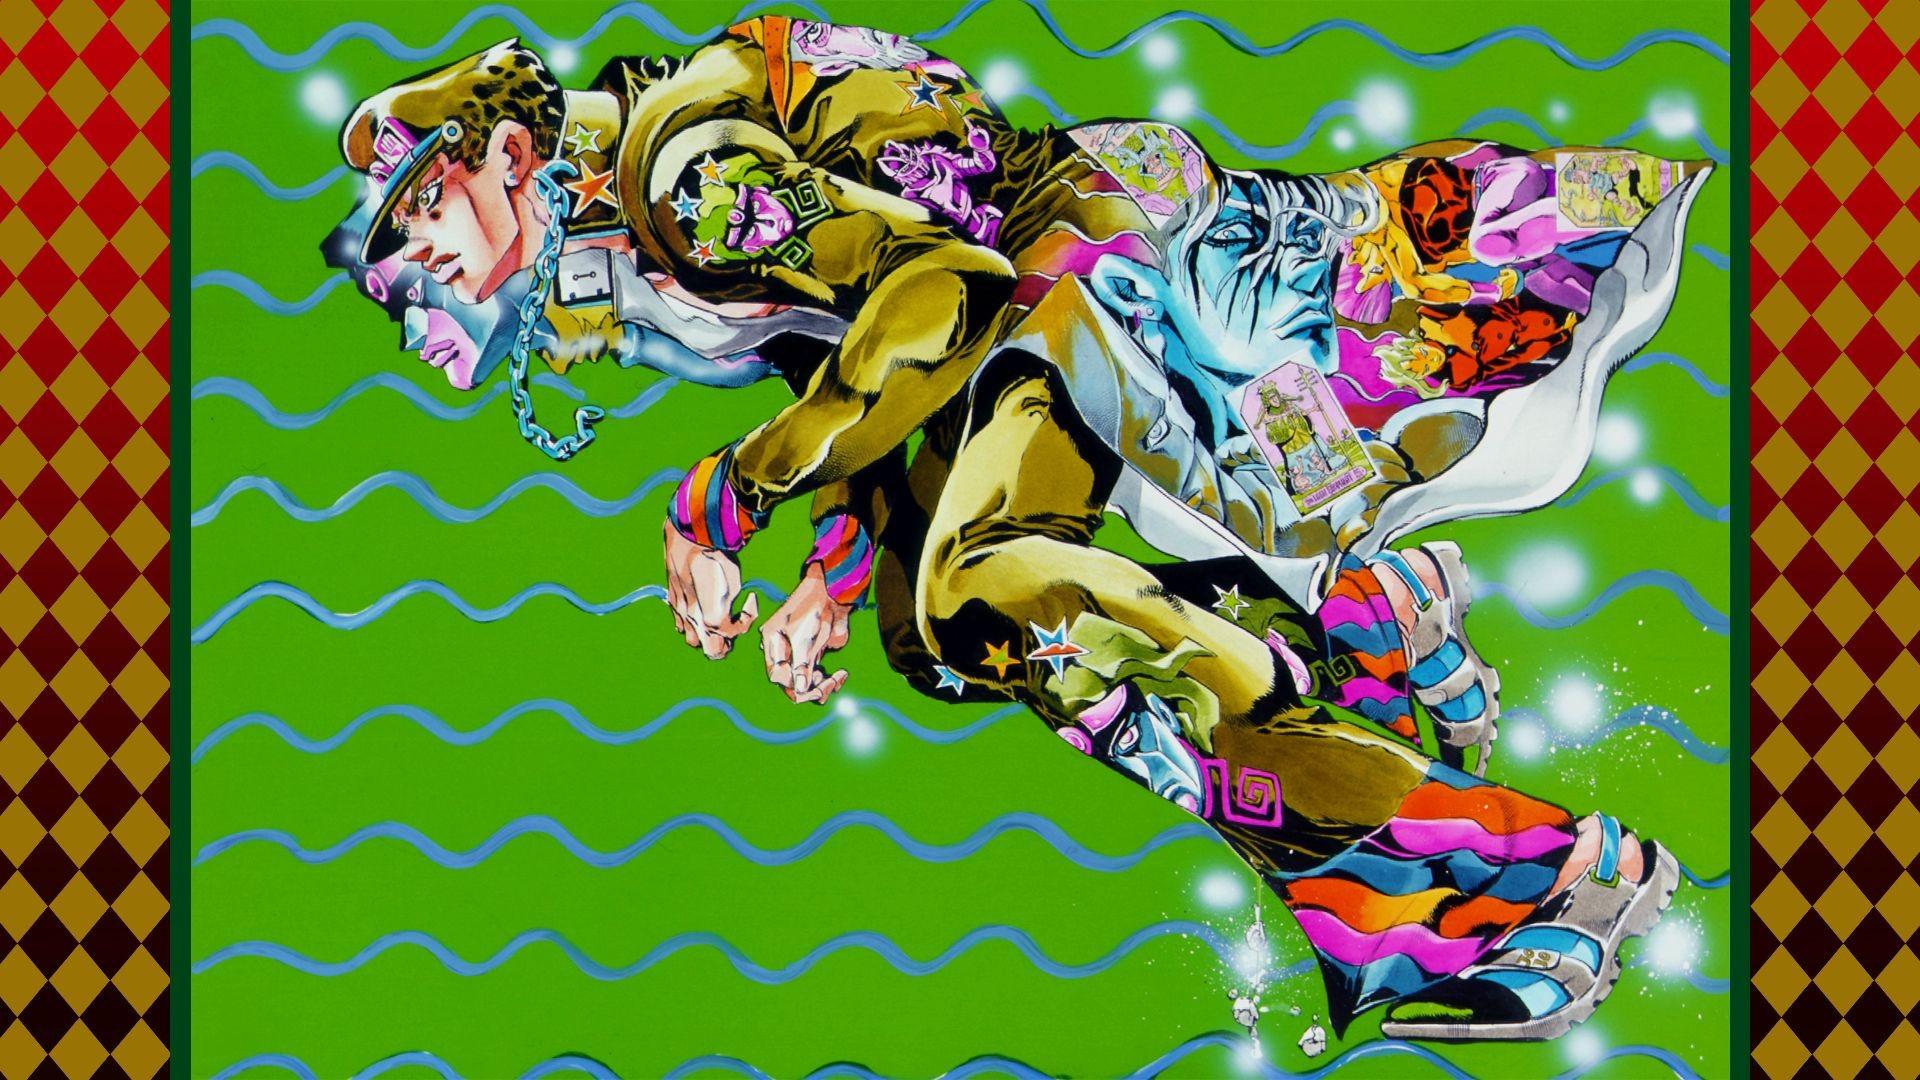 Jjba wallpaper ·① Download free beautiful High Resolution ...